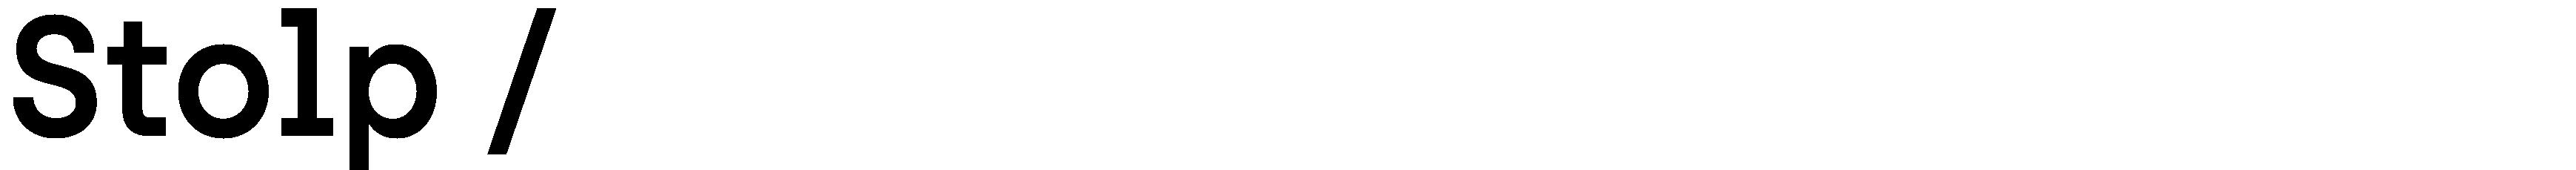 c2a46610-1e9f-11eb-ae8e-199c559d0661.png